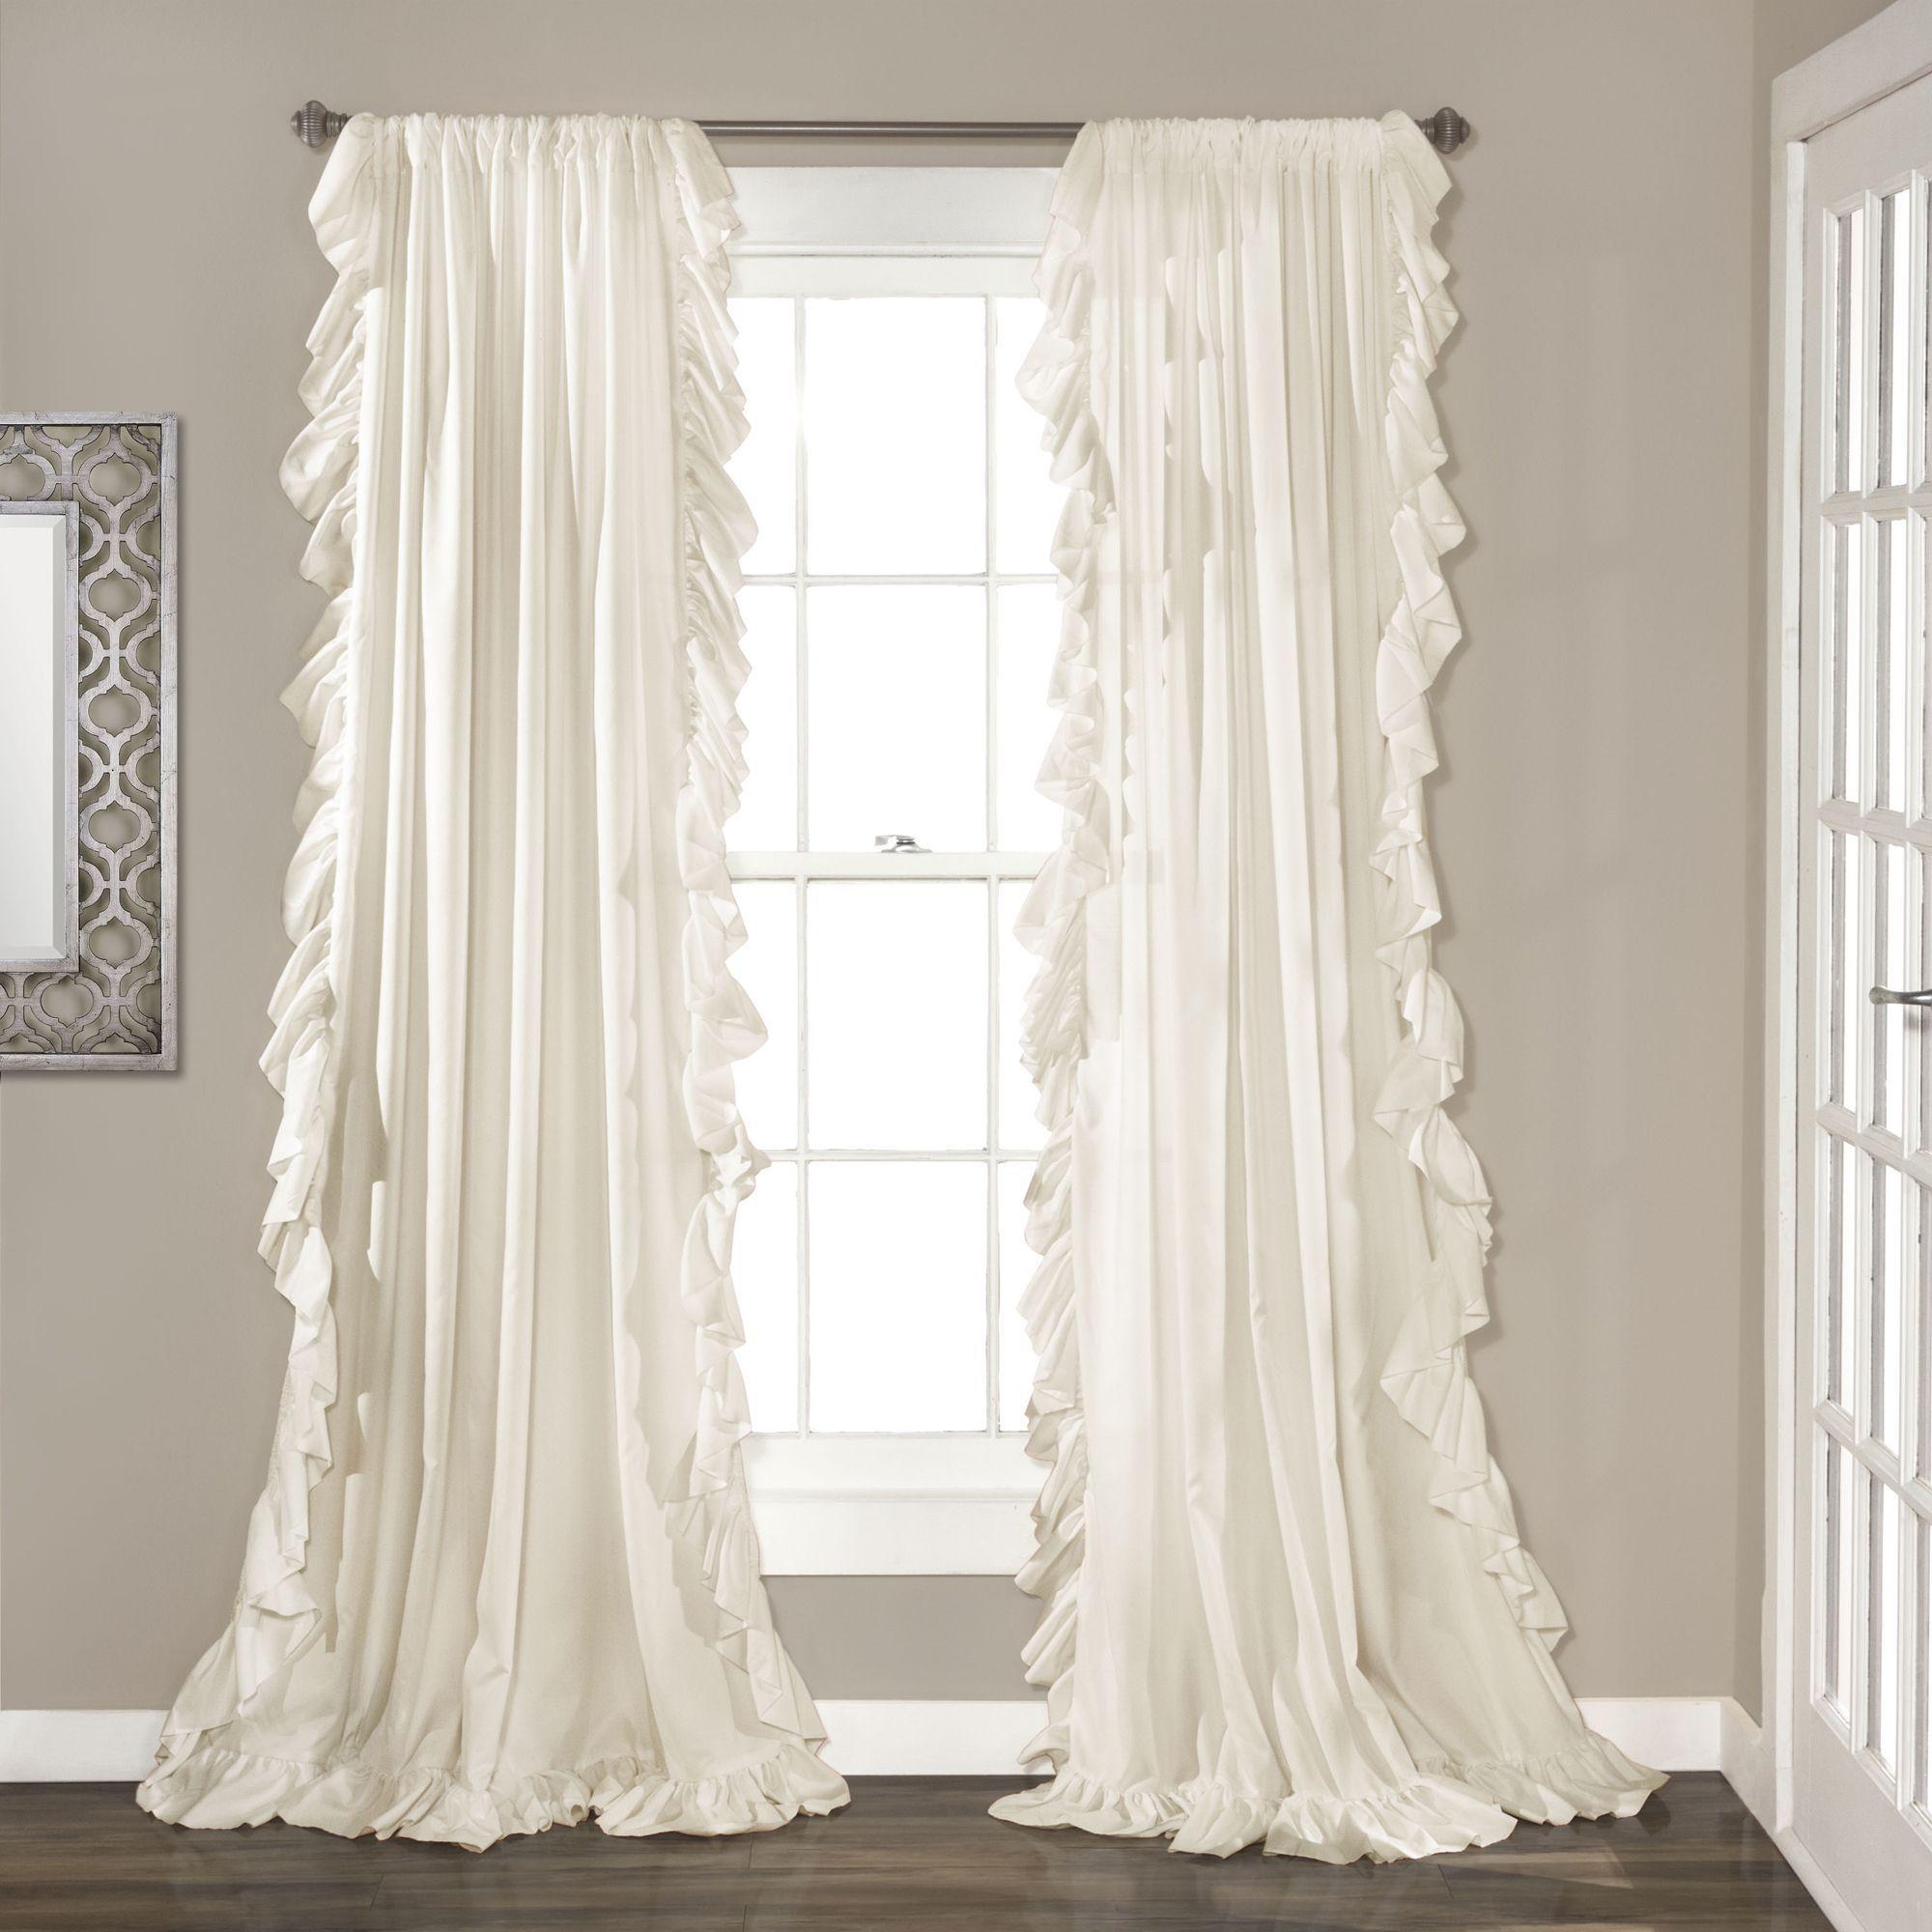 Lush Decor Reyna Curtain Panel Pair (Ivory), Beige Off-White, Size ...